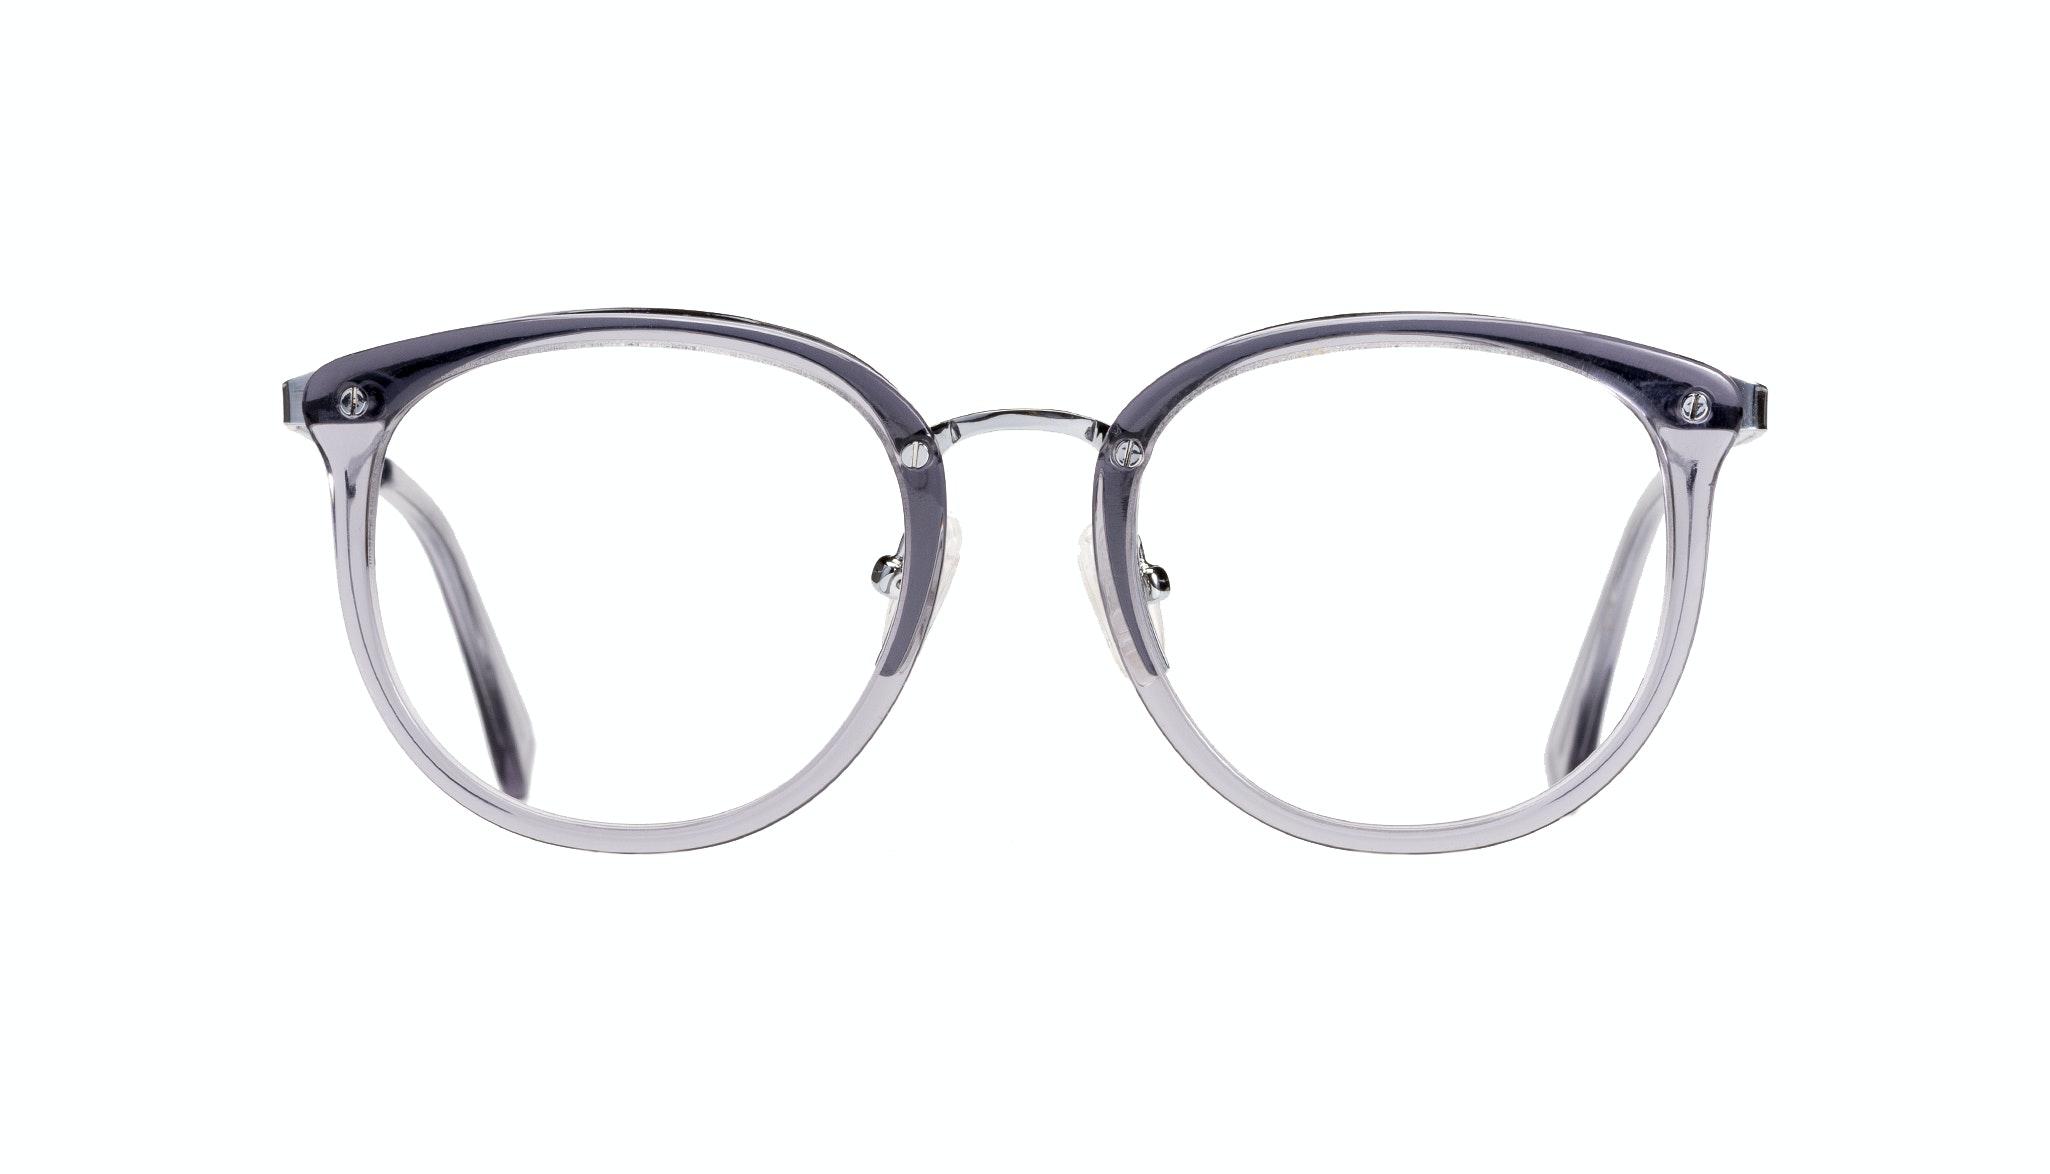 Affordable Fashion Glasses Round Eyeglasses Women Amaze Petite Cloud